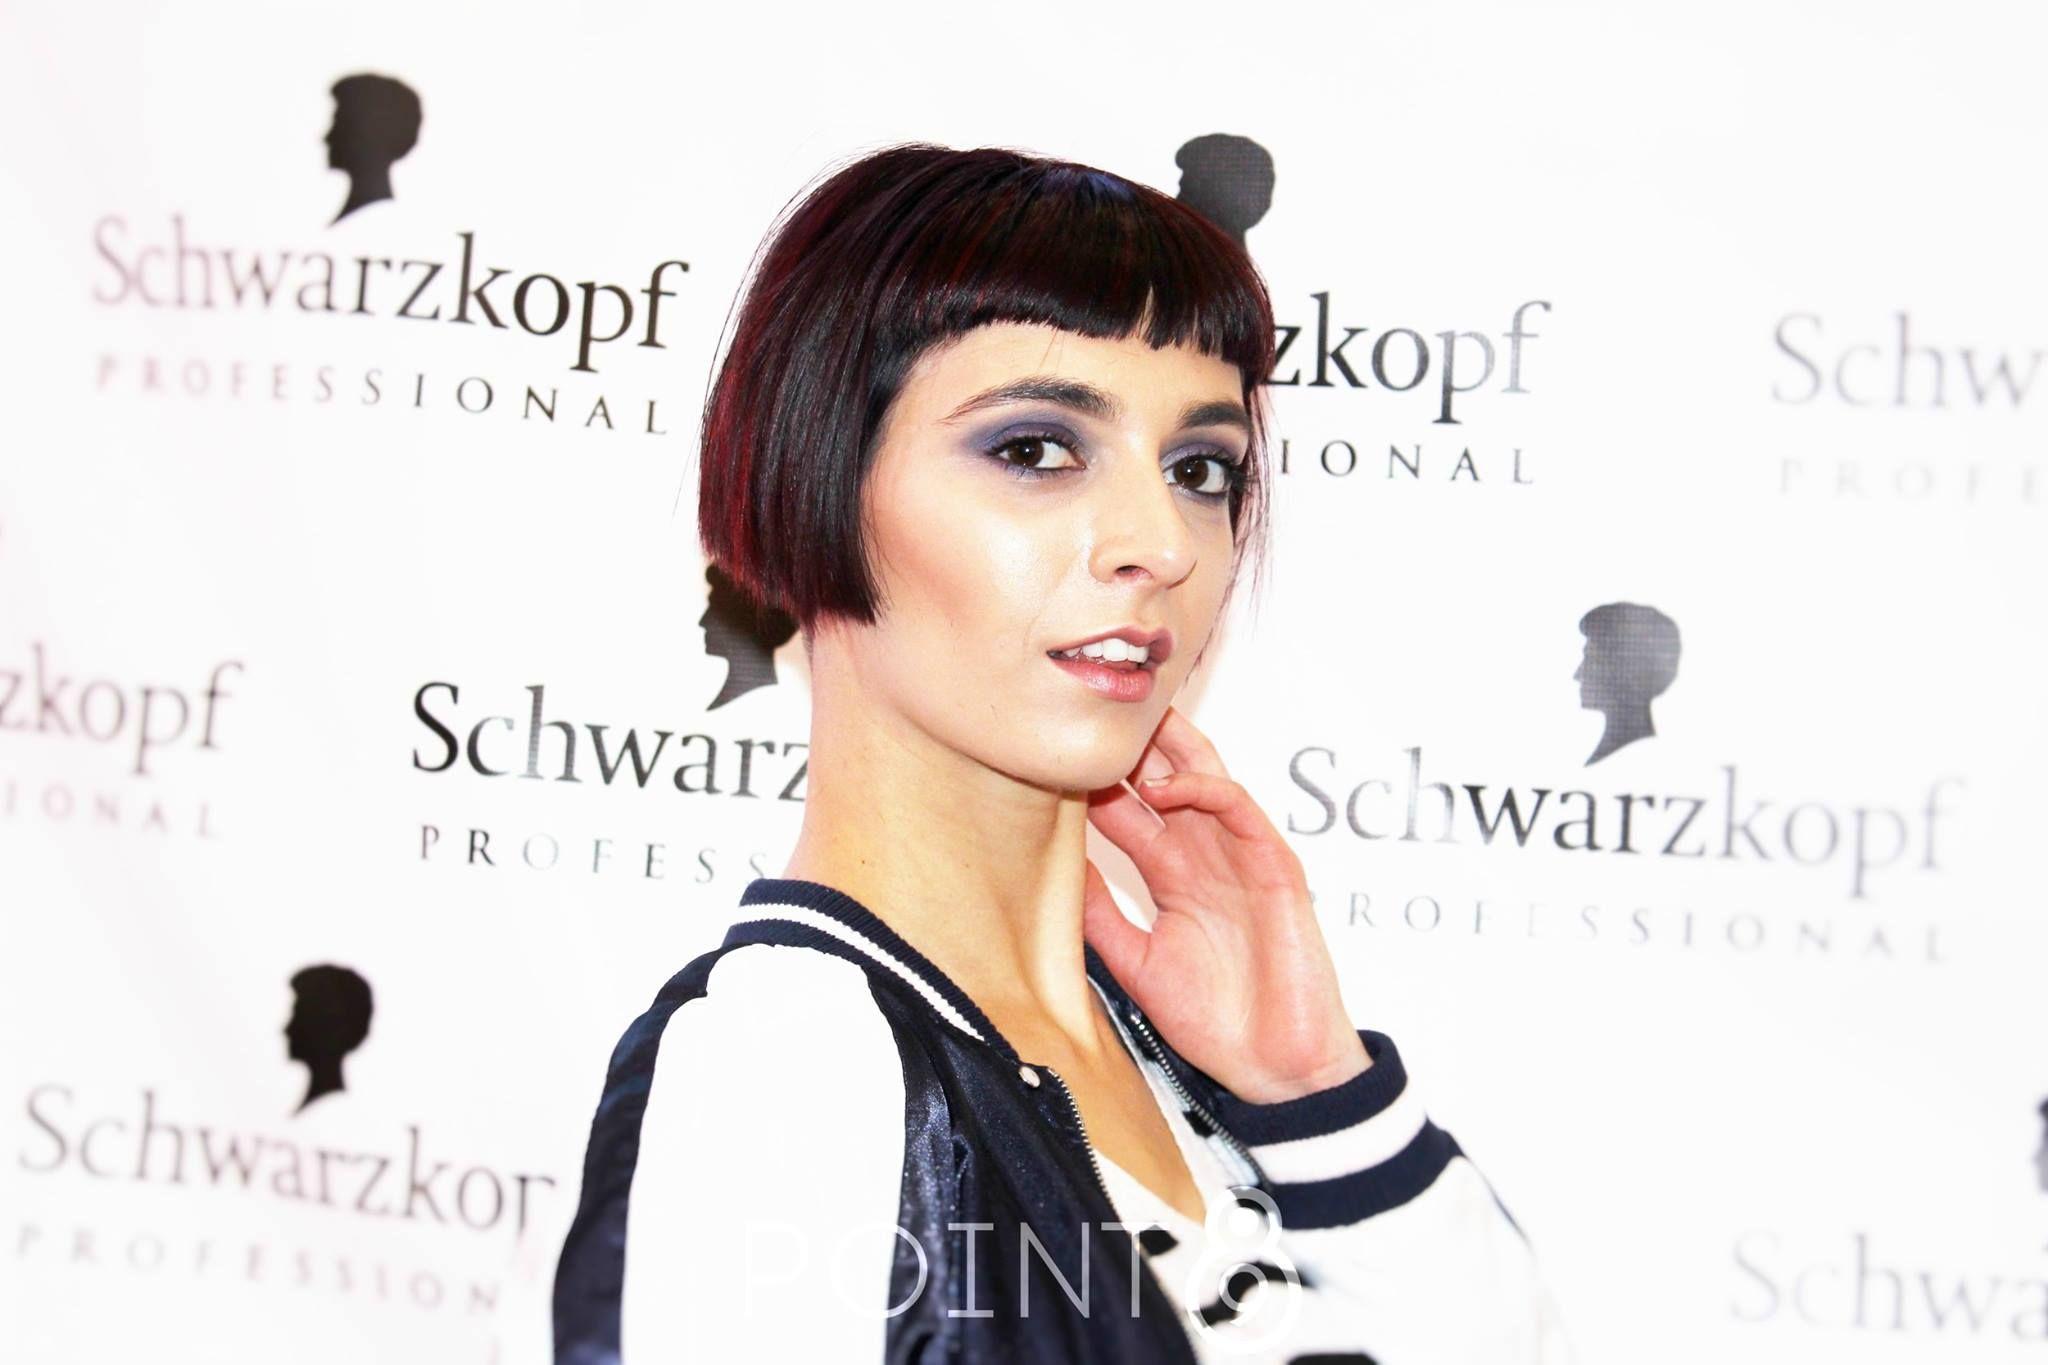 SCHWARZKOPF HAIR SHOW 2016, Yerevan